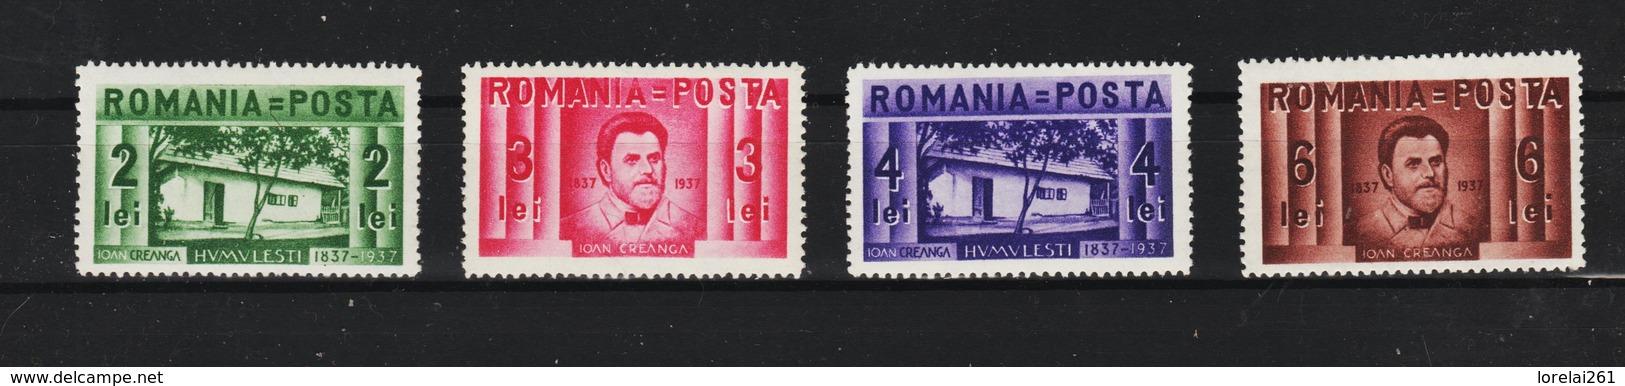 1937 -  L Ecrivain Ion Creanga Mi No 524/527   MNH - Ungebraucht